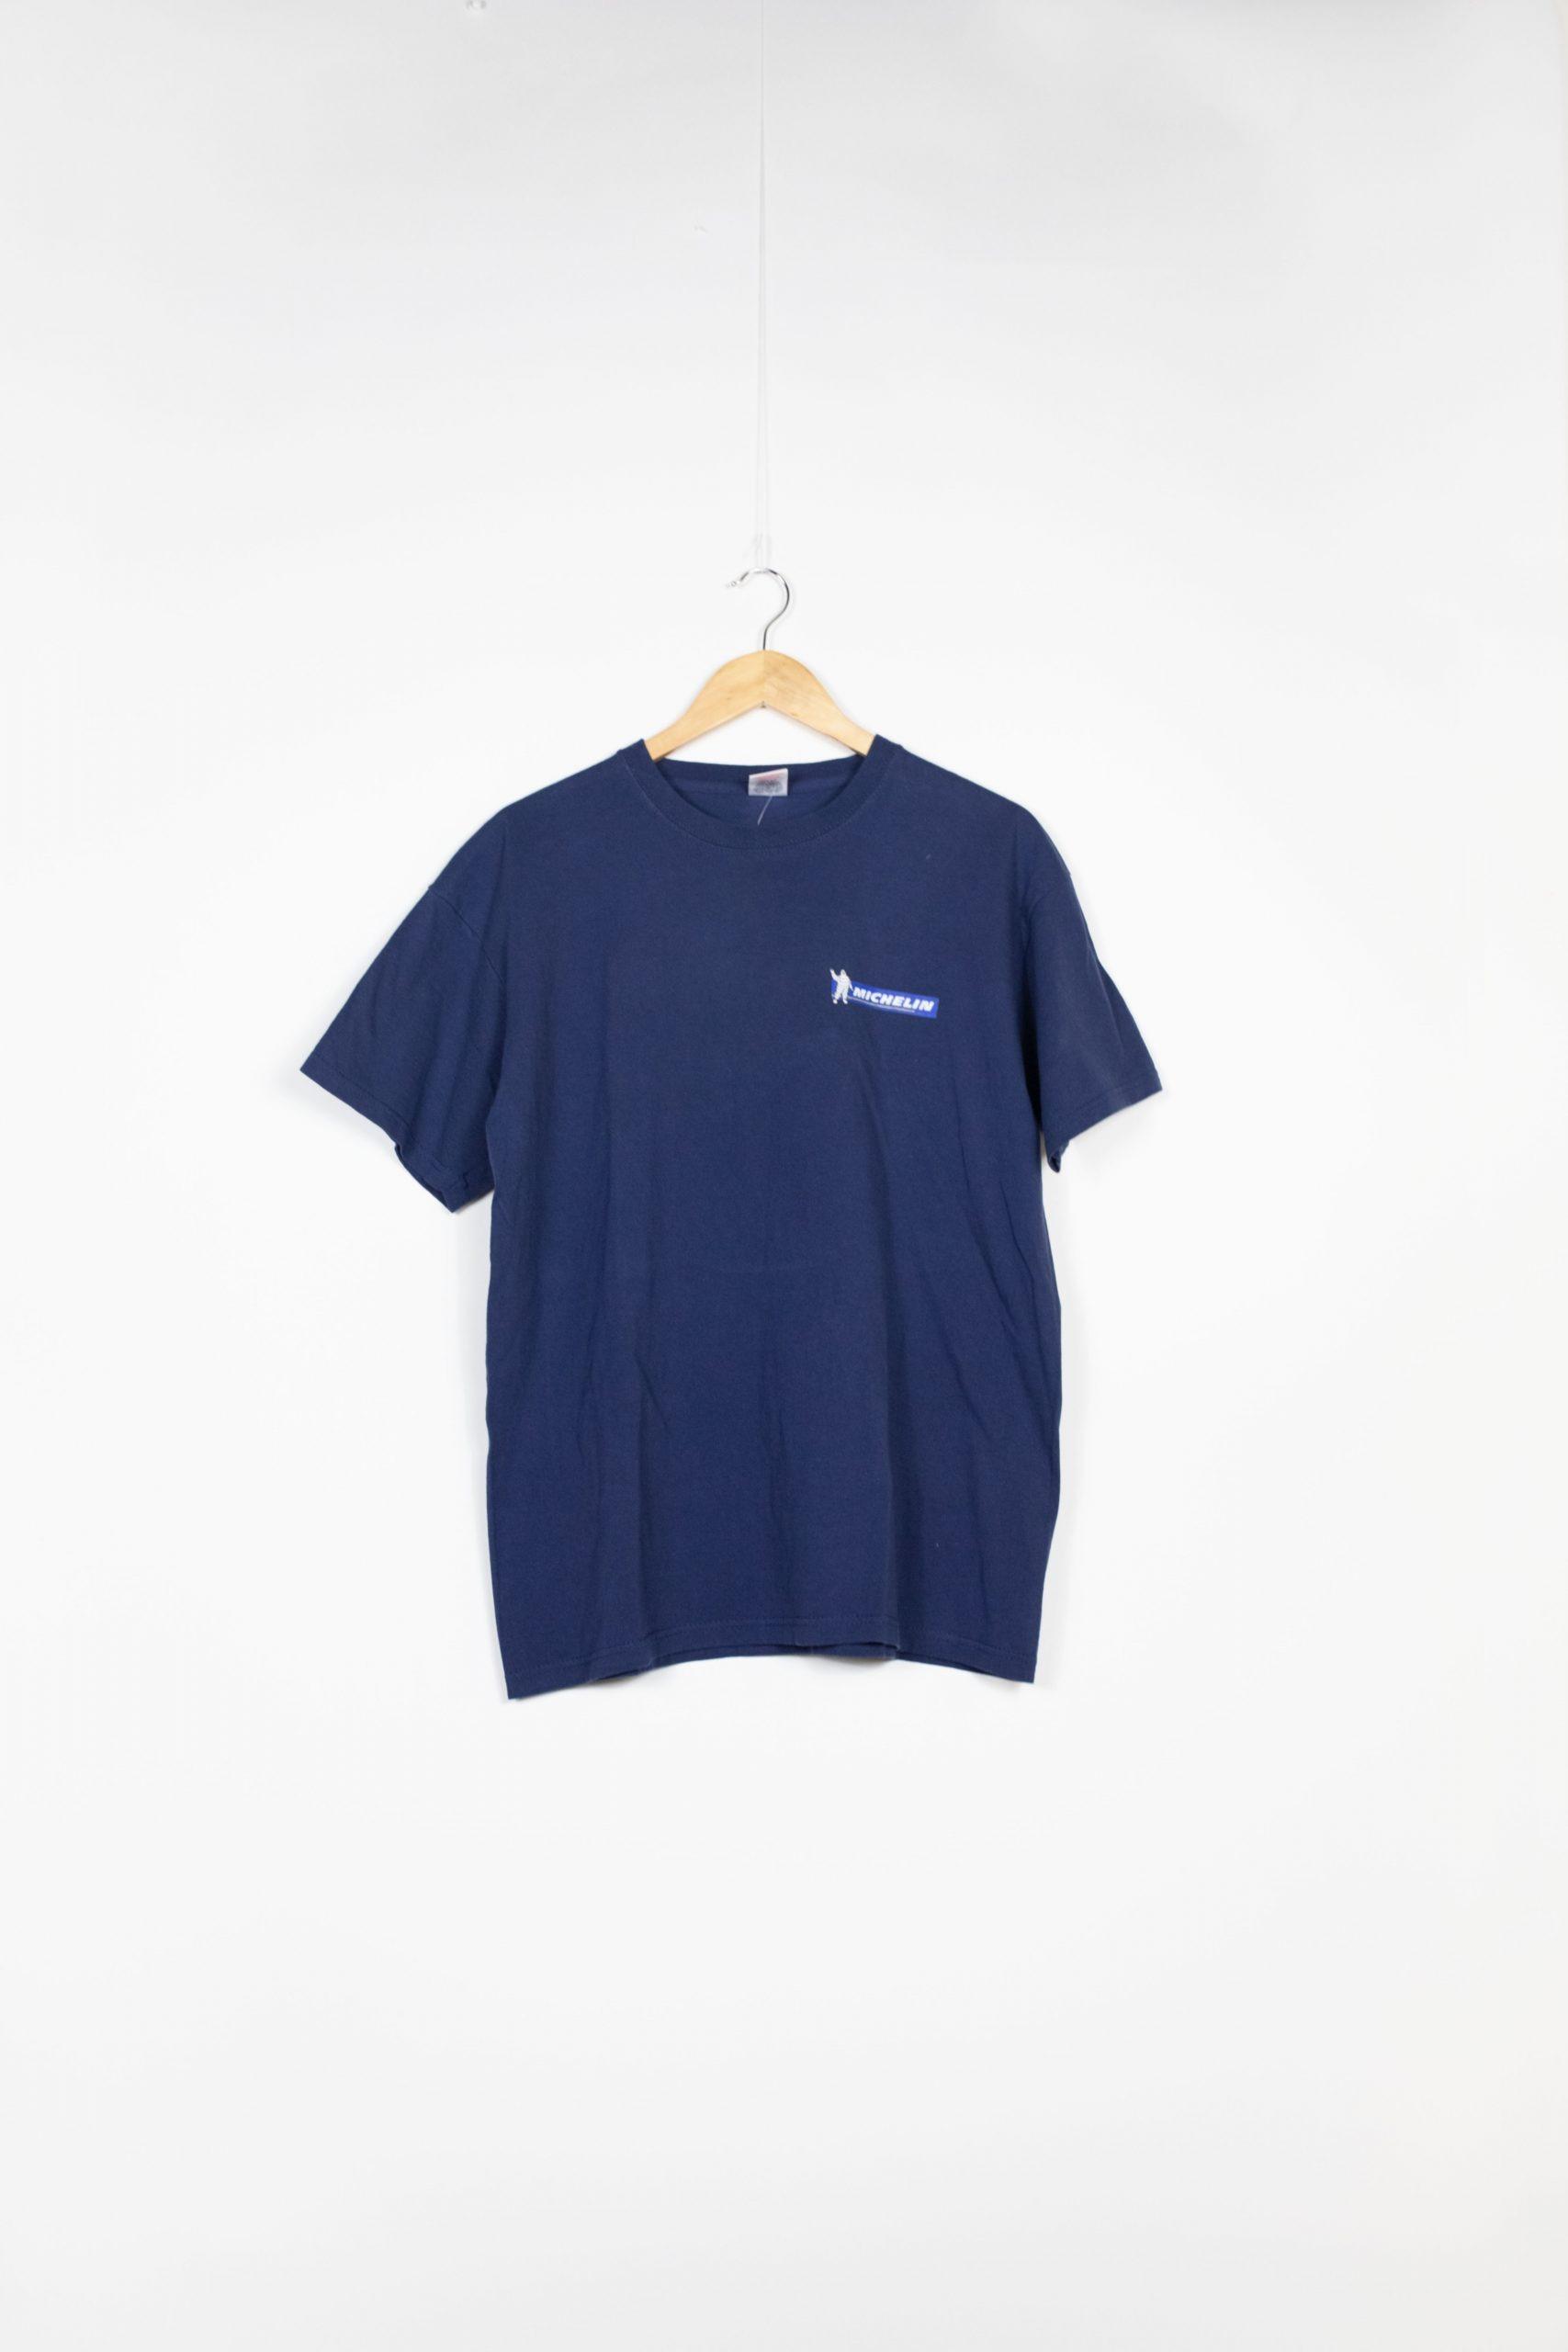 Tee shirt Michelin